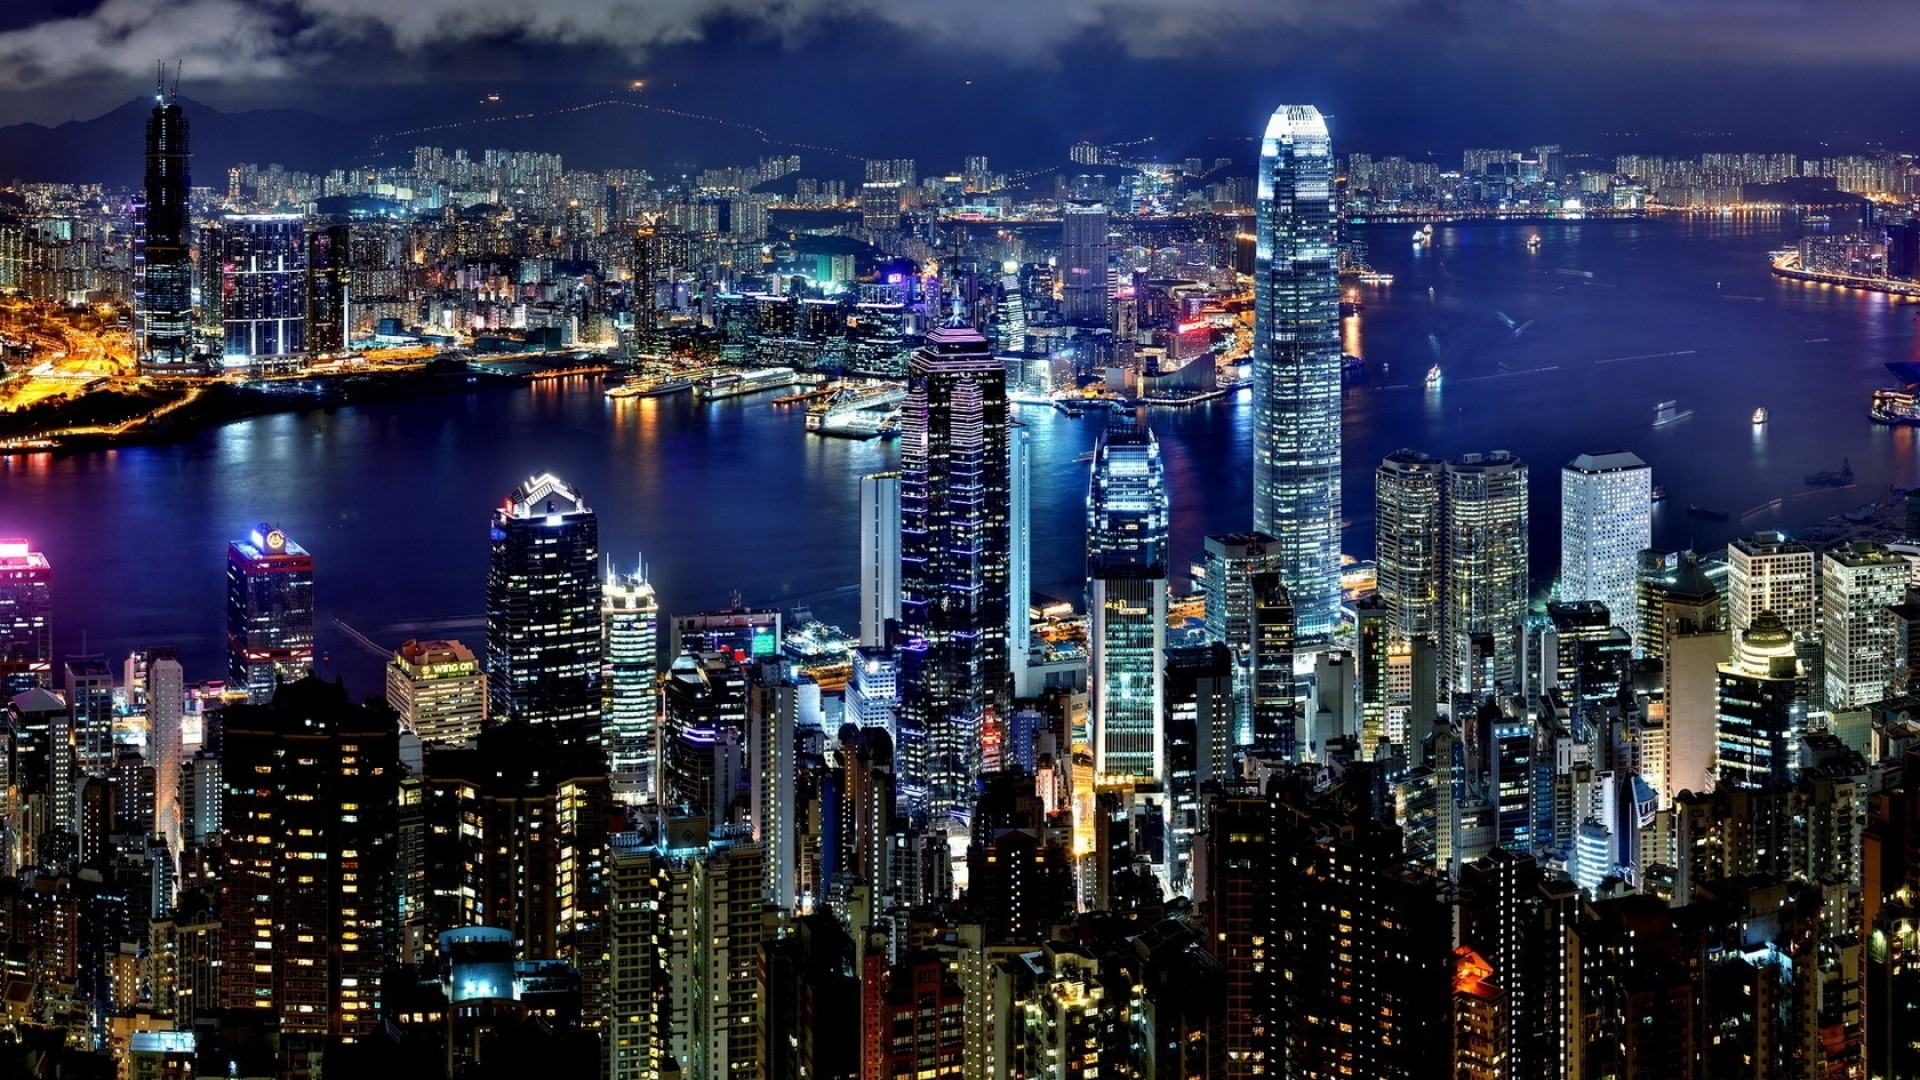 Wallpaper hong kong, city, night, lights, skyscrapers, water